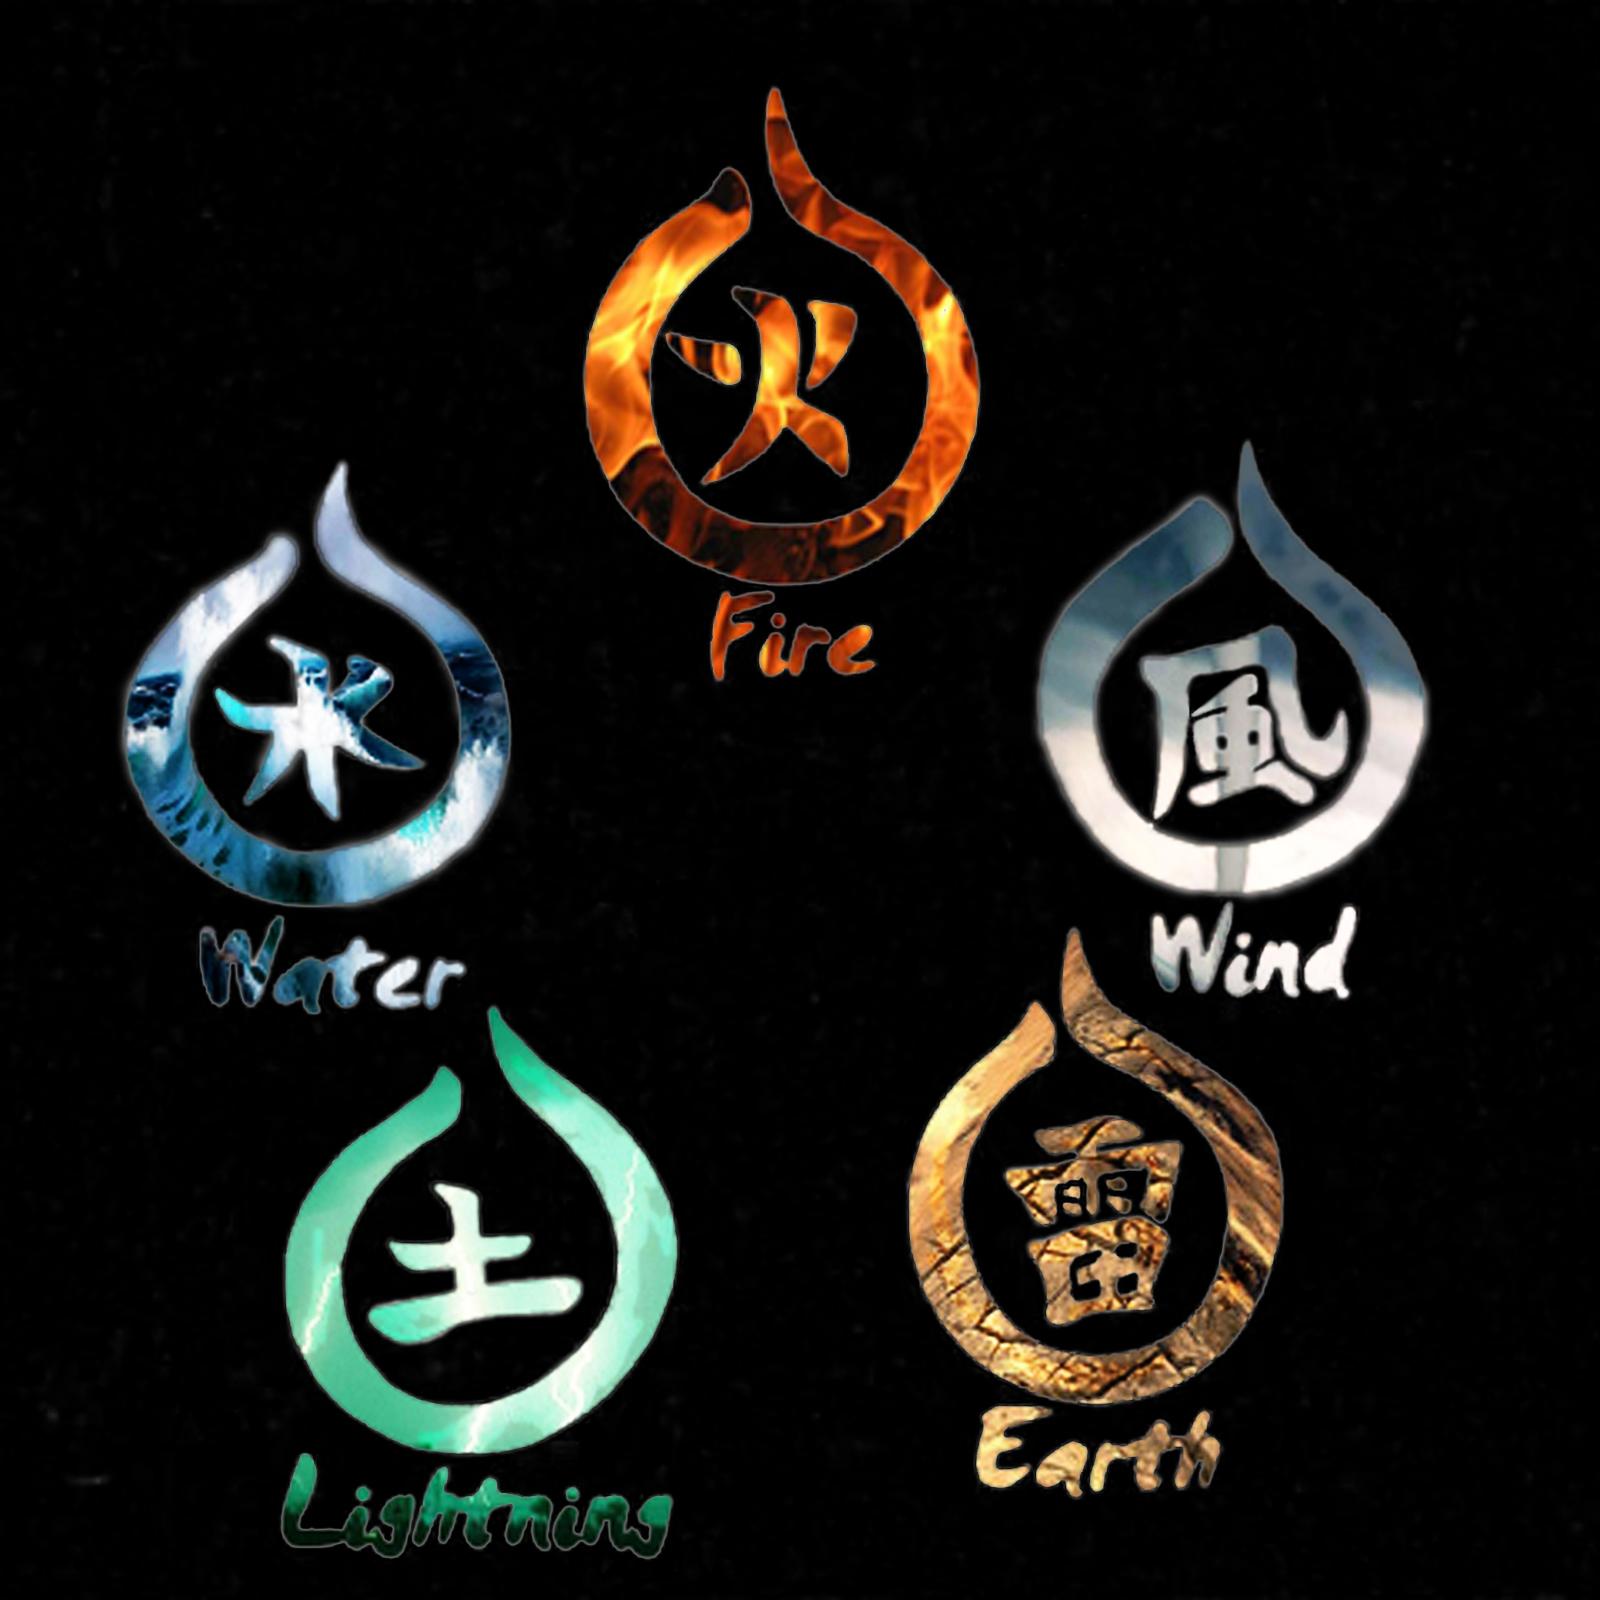 elements 2: